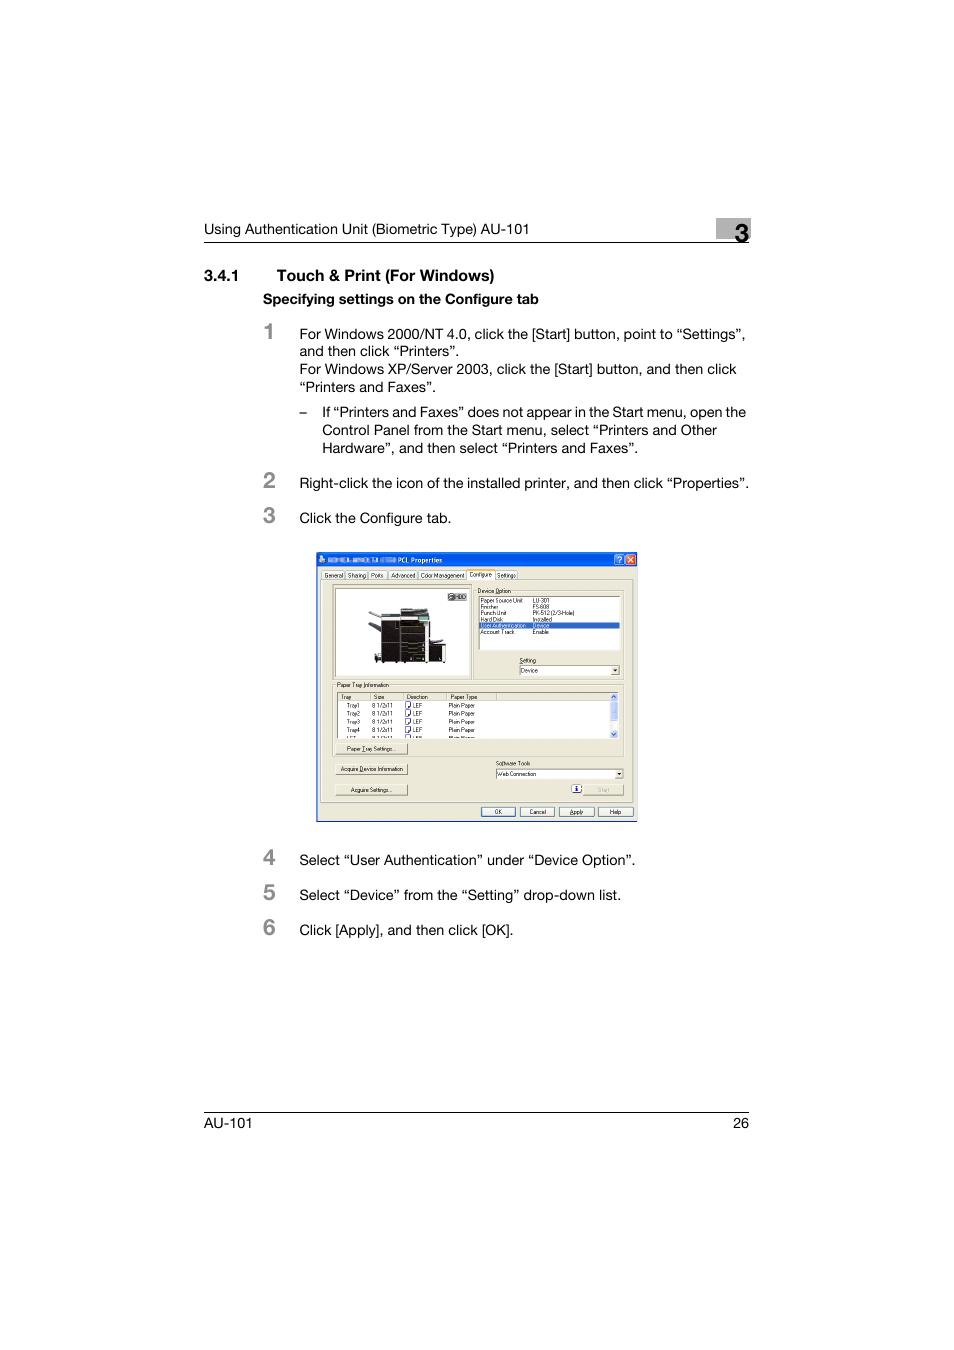 1 touch & print (for windows), Touch & print (for windows)